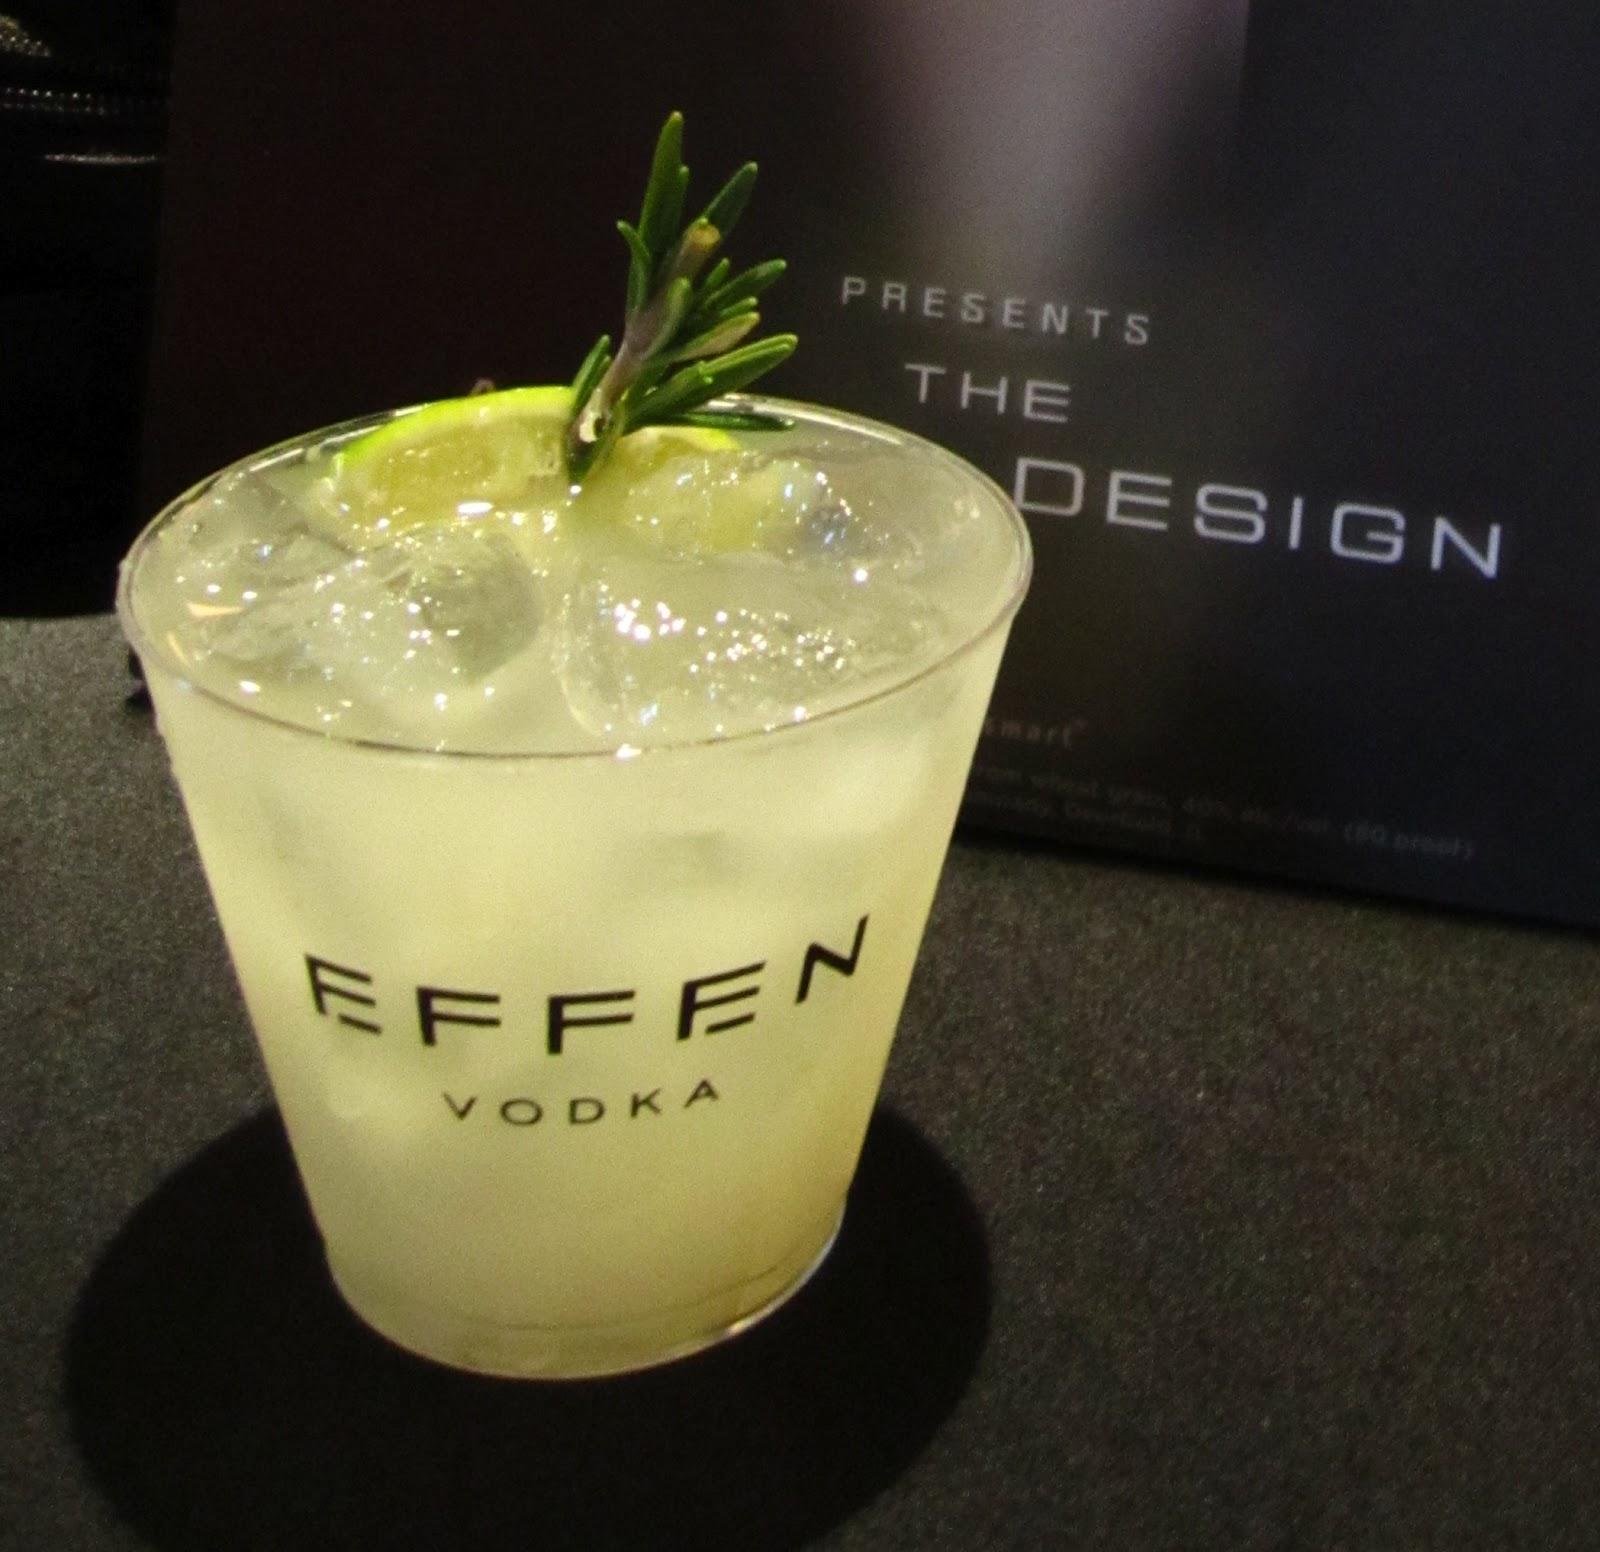 The Happy Hour Tour: Effen Vodka Presents The Art Of Design